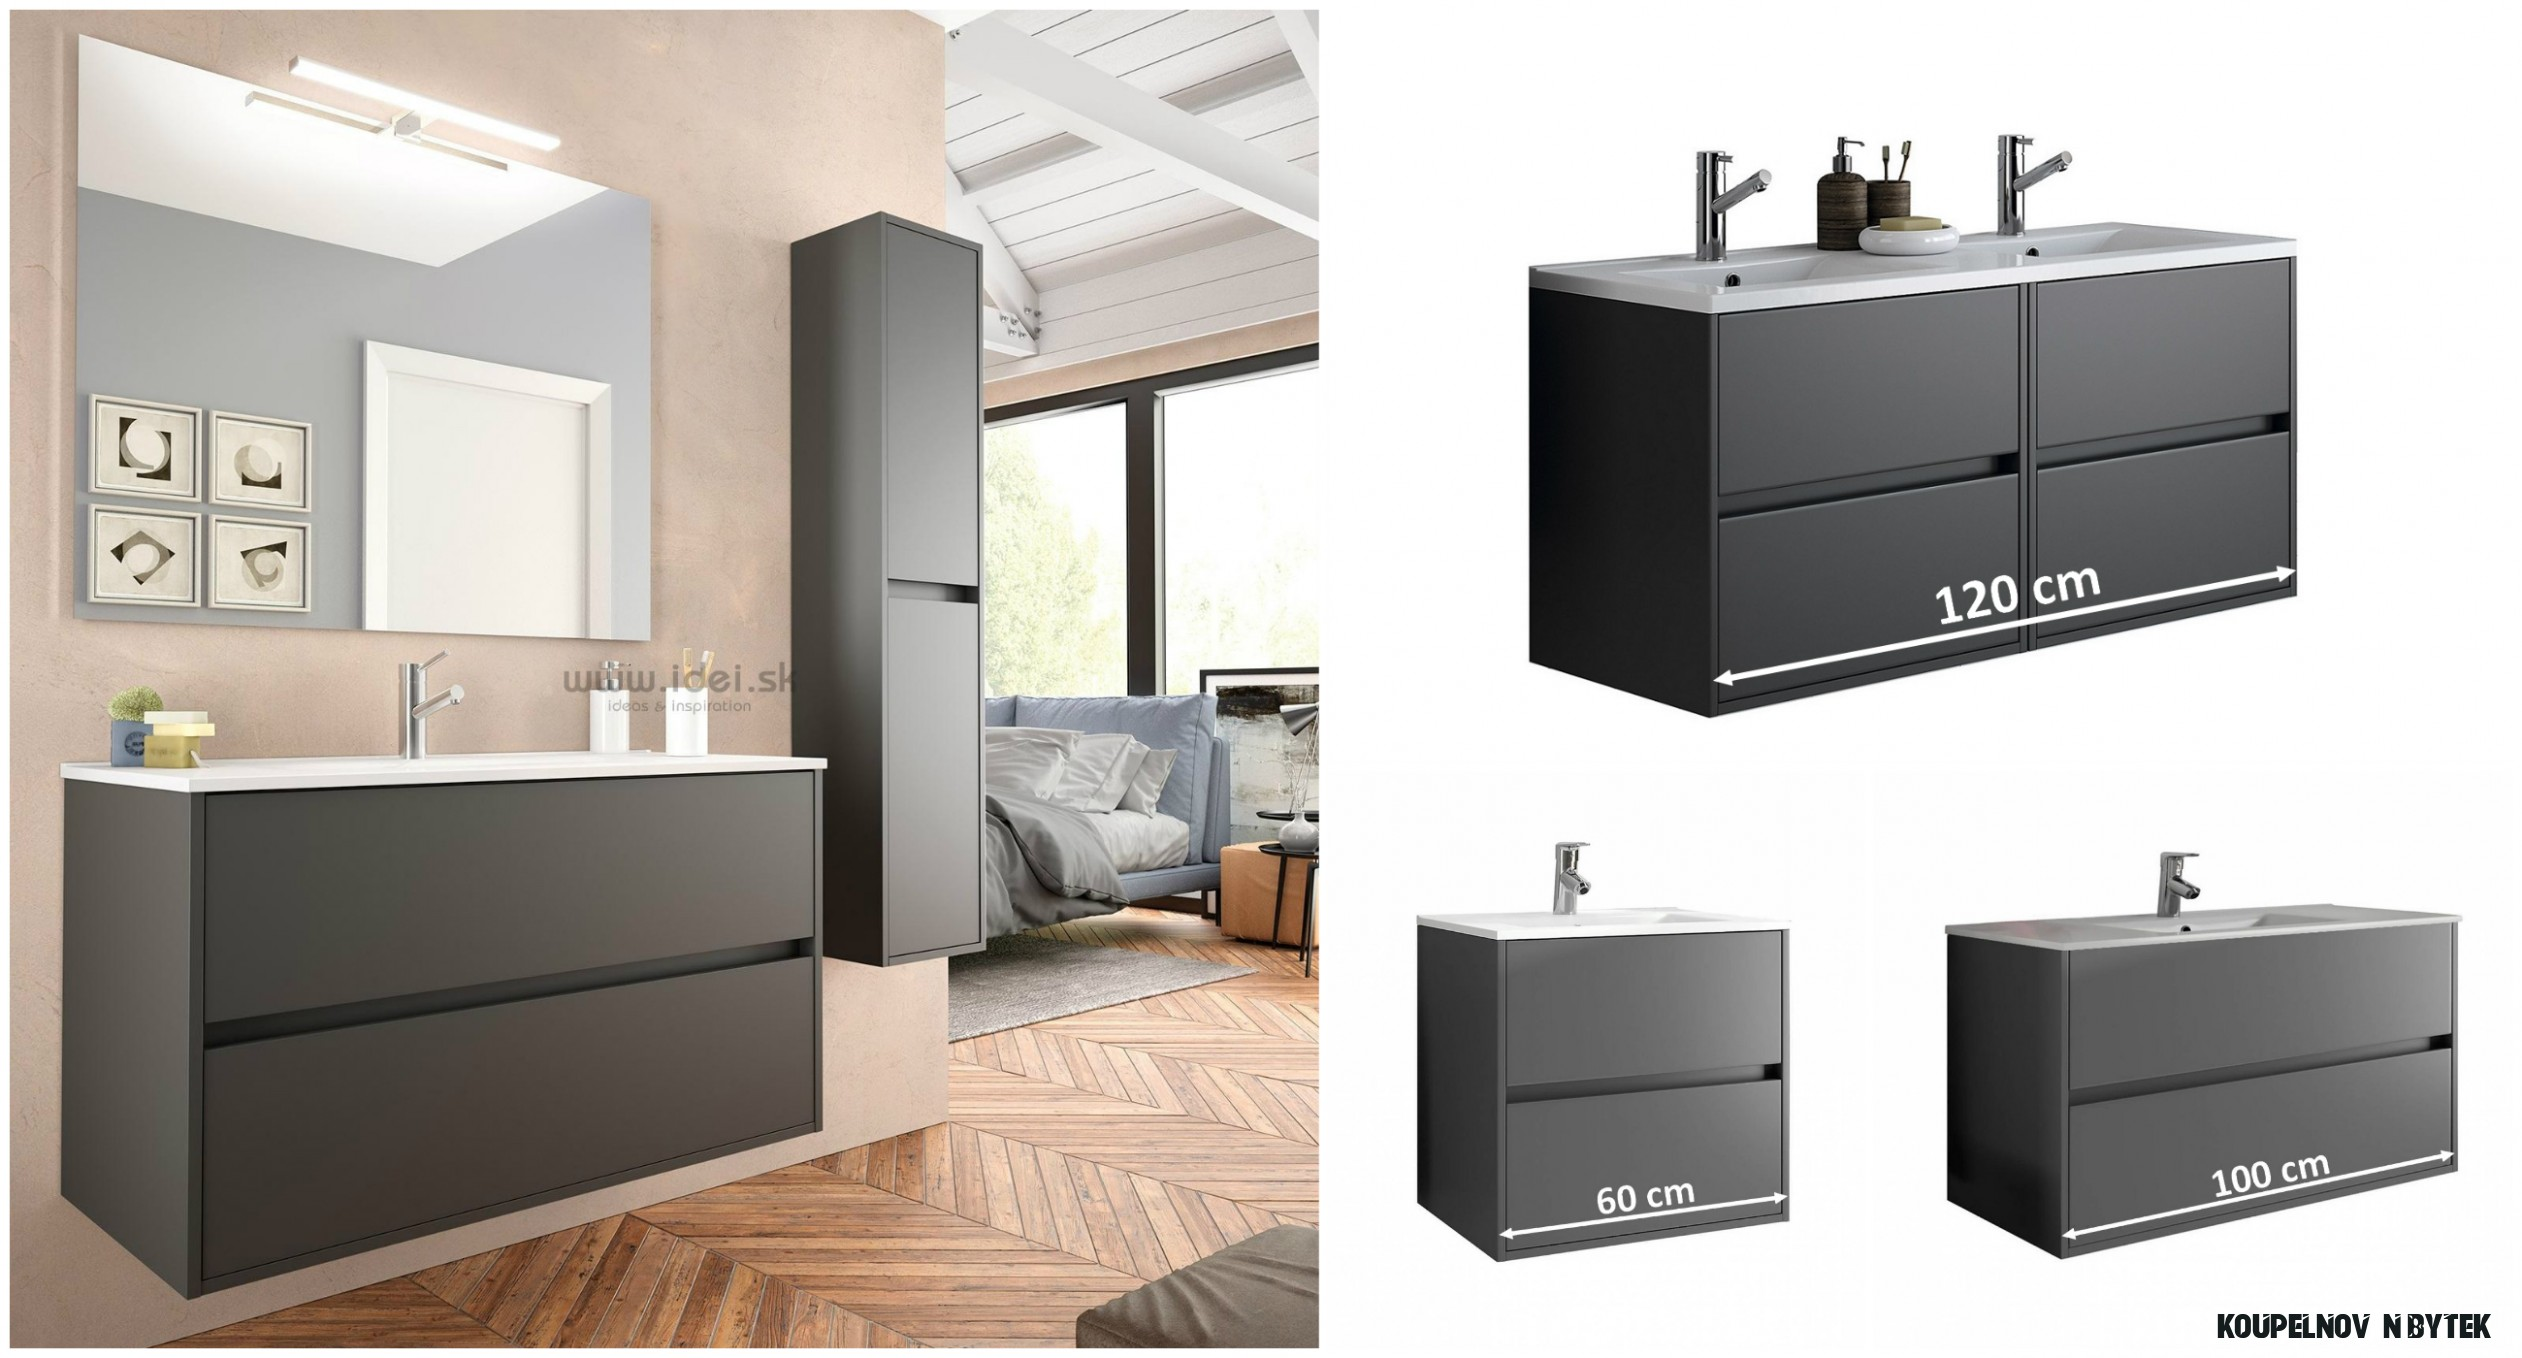 Salgar koupelnový nábytek matný šedý + umyvadlo  IDEI.CZ